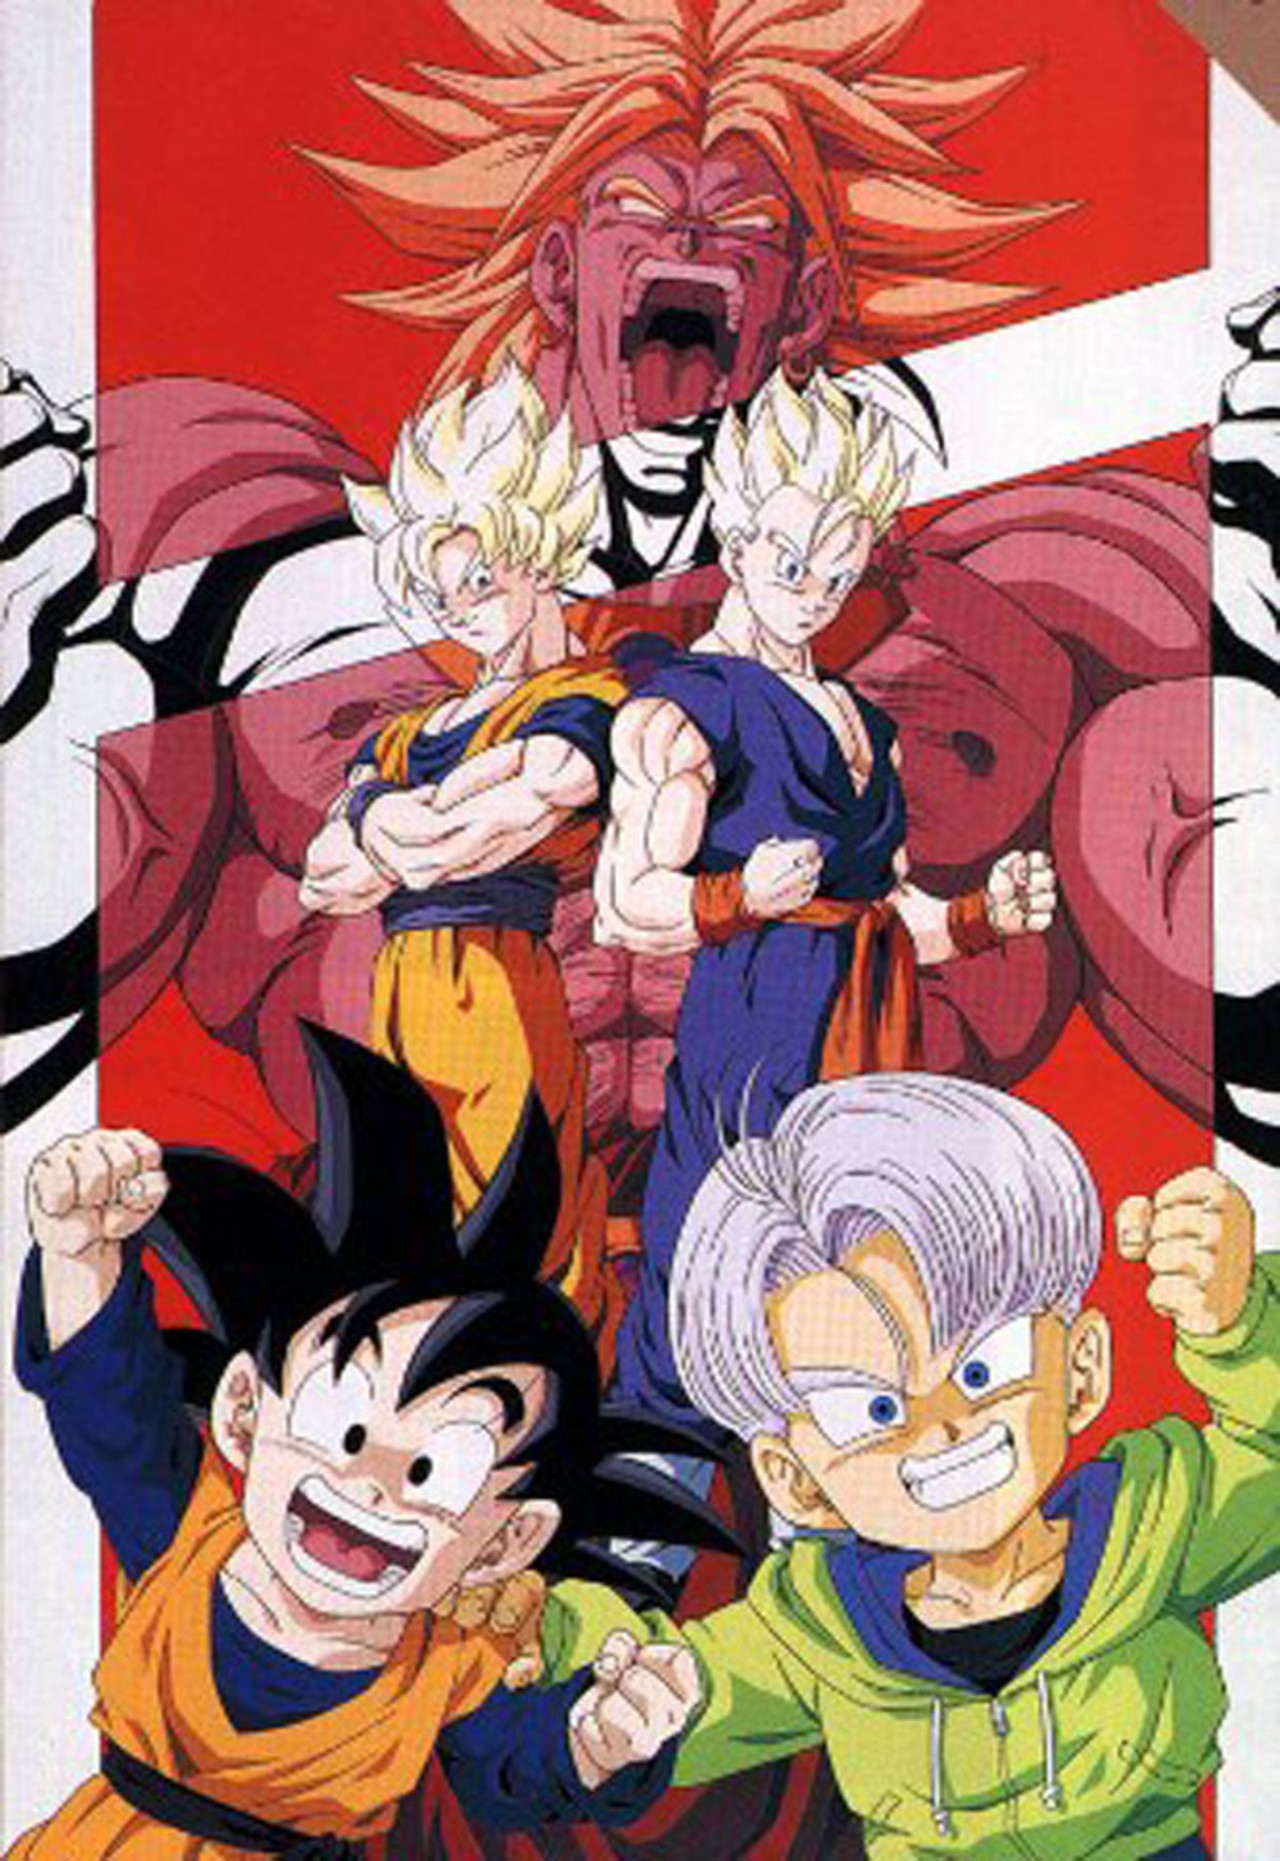 Dragon Ball Z: Broly - Second Coming kapak